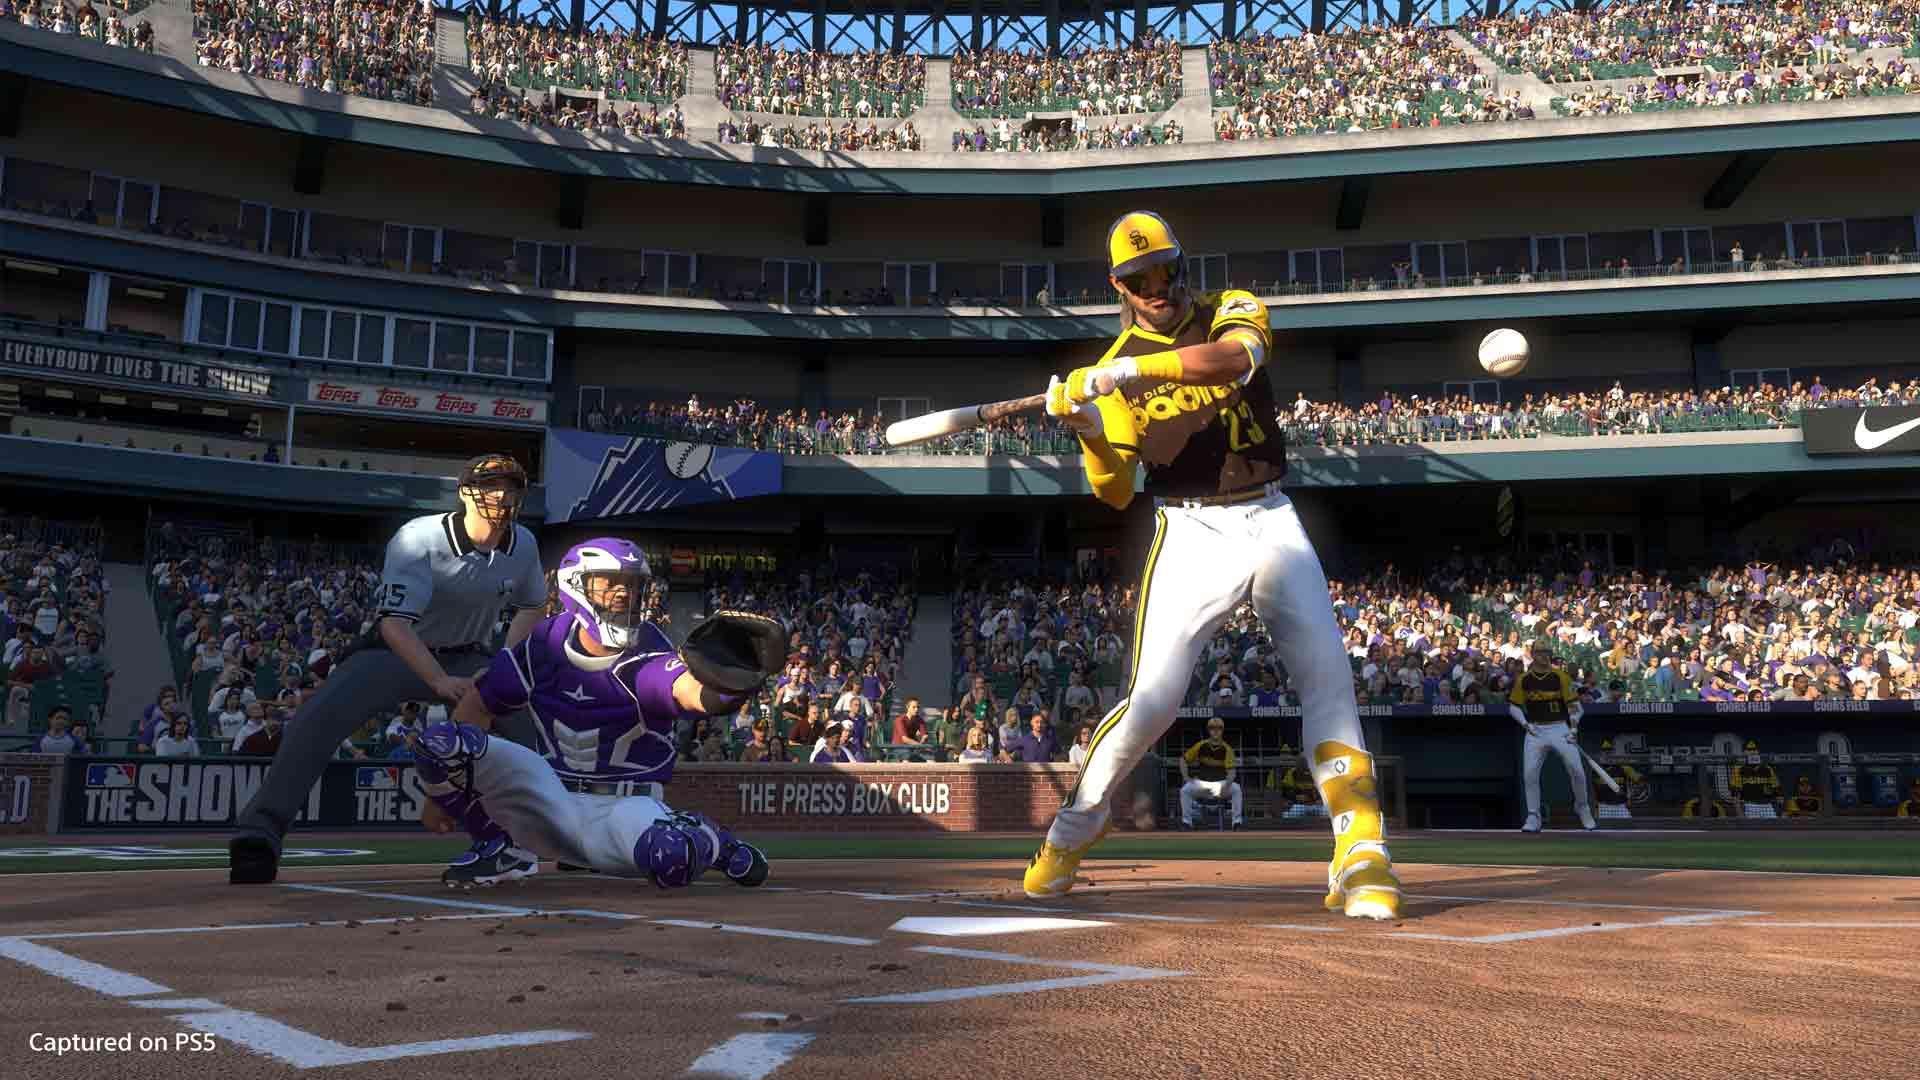 MLB The Show 21 Xbox Series X vs Playstation 5